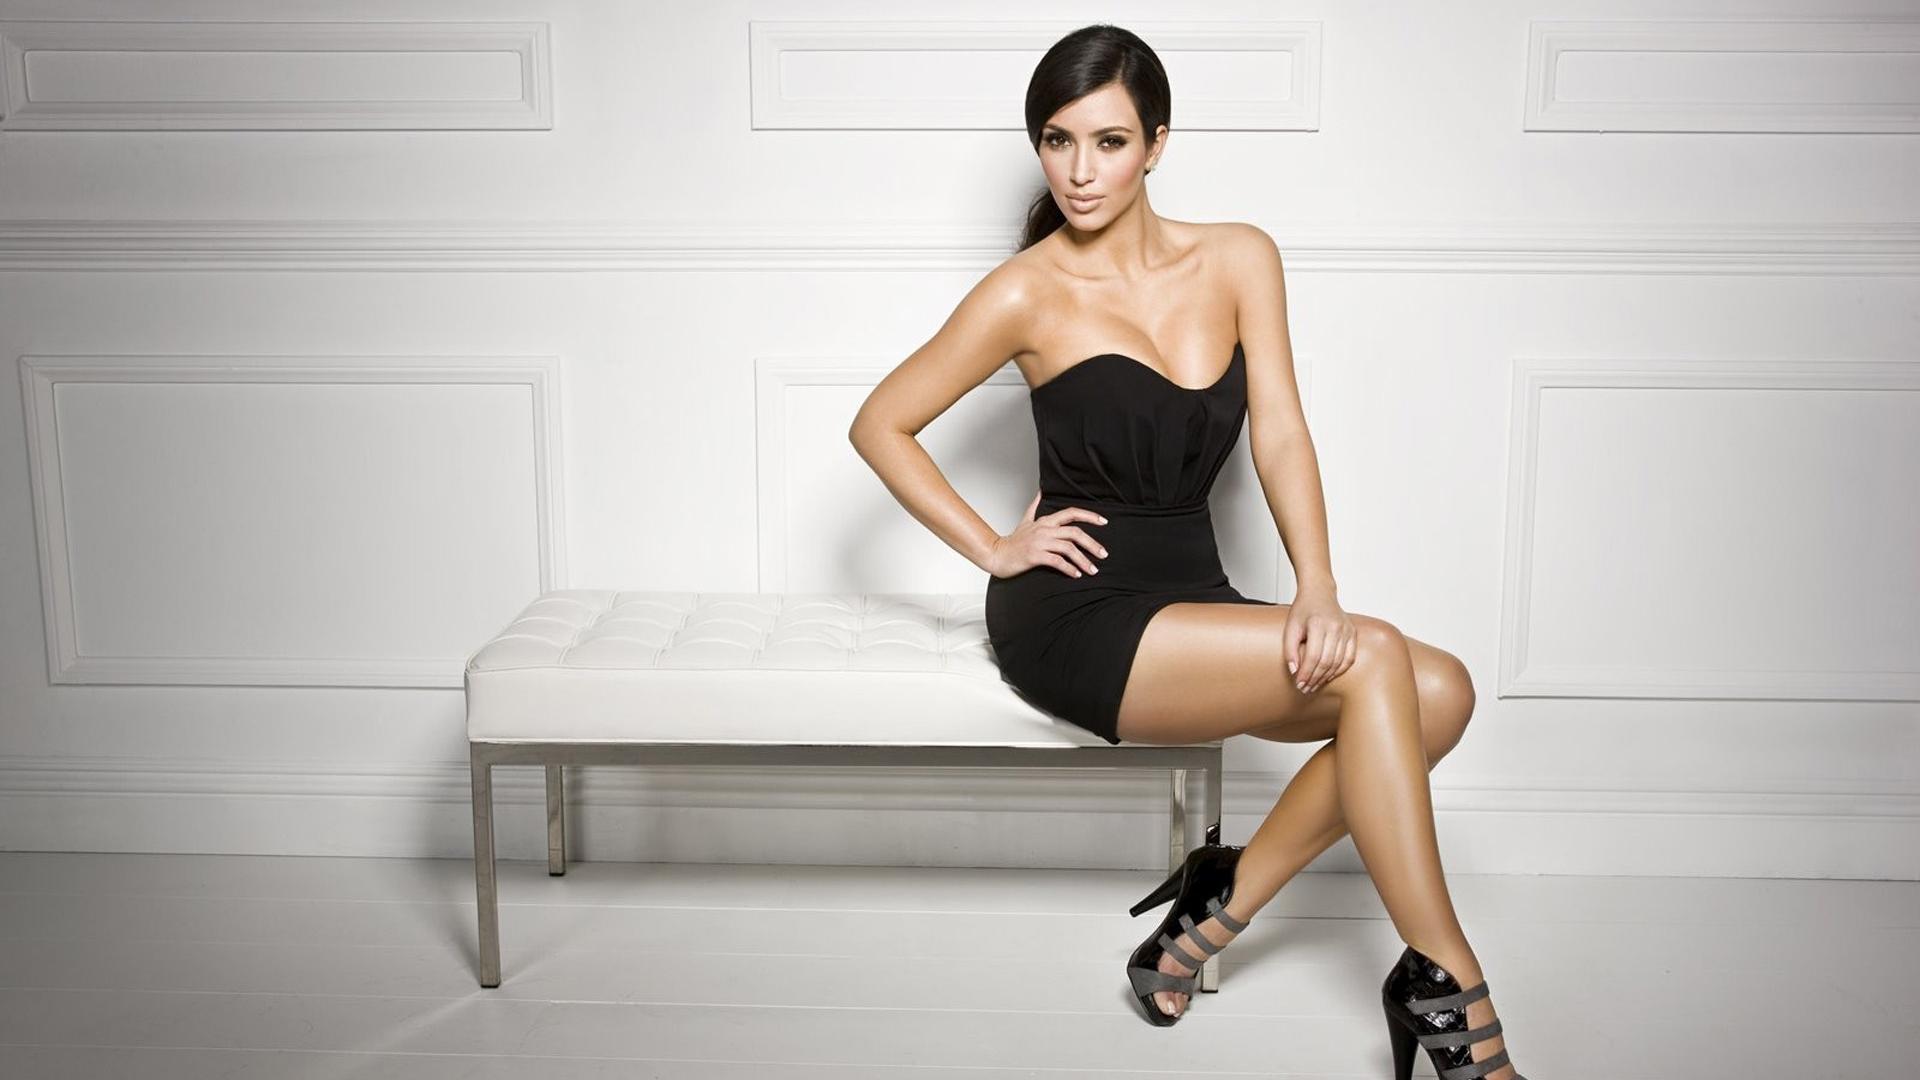 1920x1080 Kim Kardashian Hd Pics 1080p Laptop Full Hd